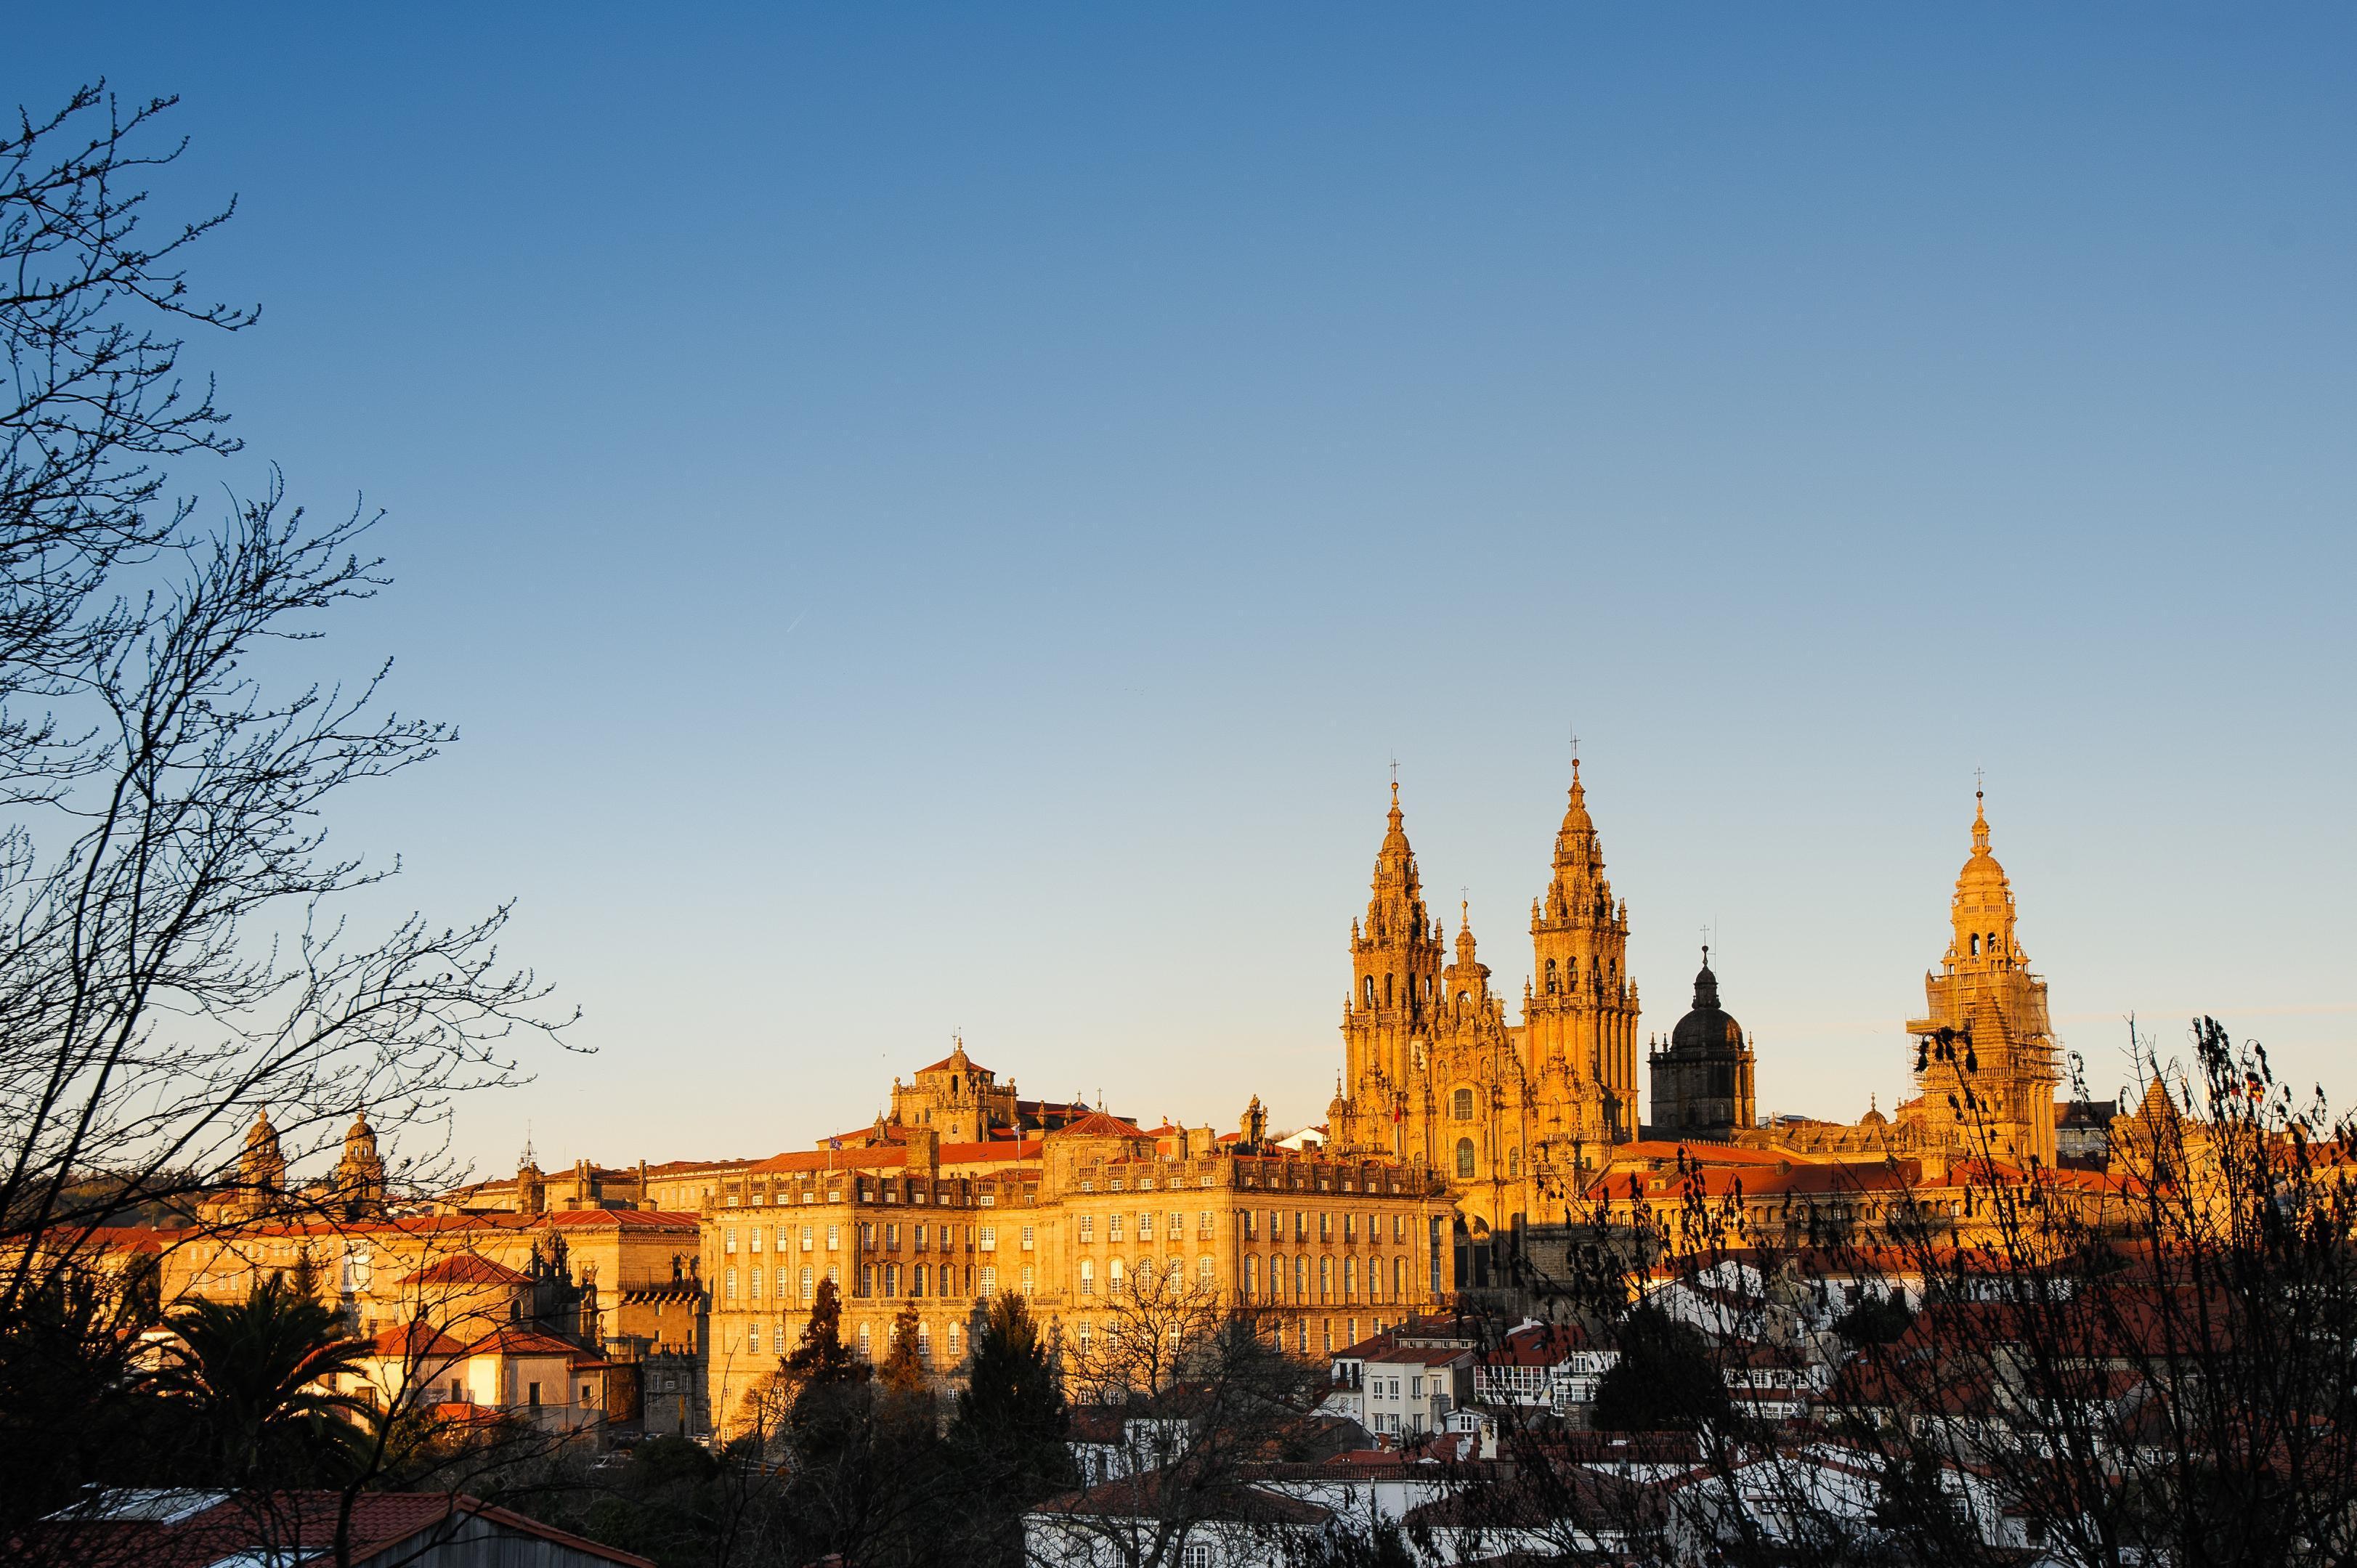 How to Spend 1 Day in Santiago de Compostela